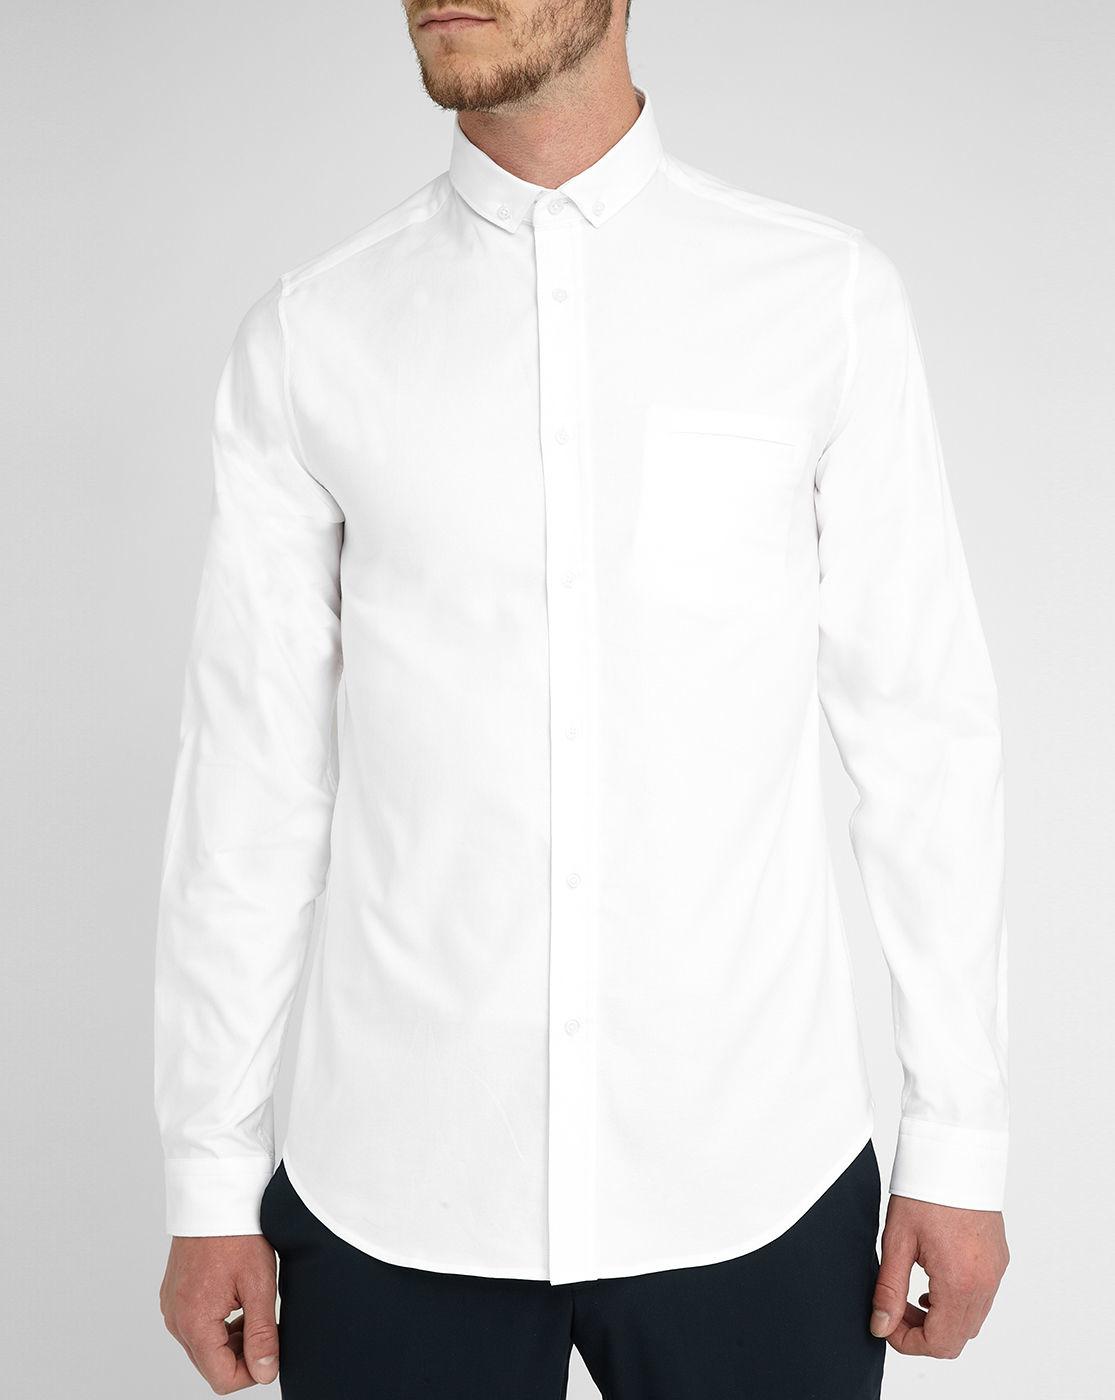 White Gabriel Extra Slim Fit Oxford Small Button